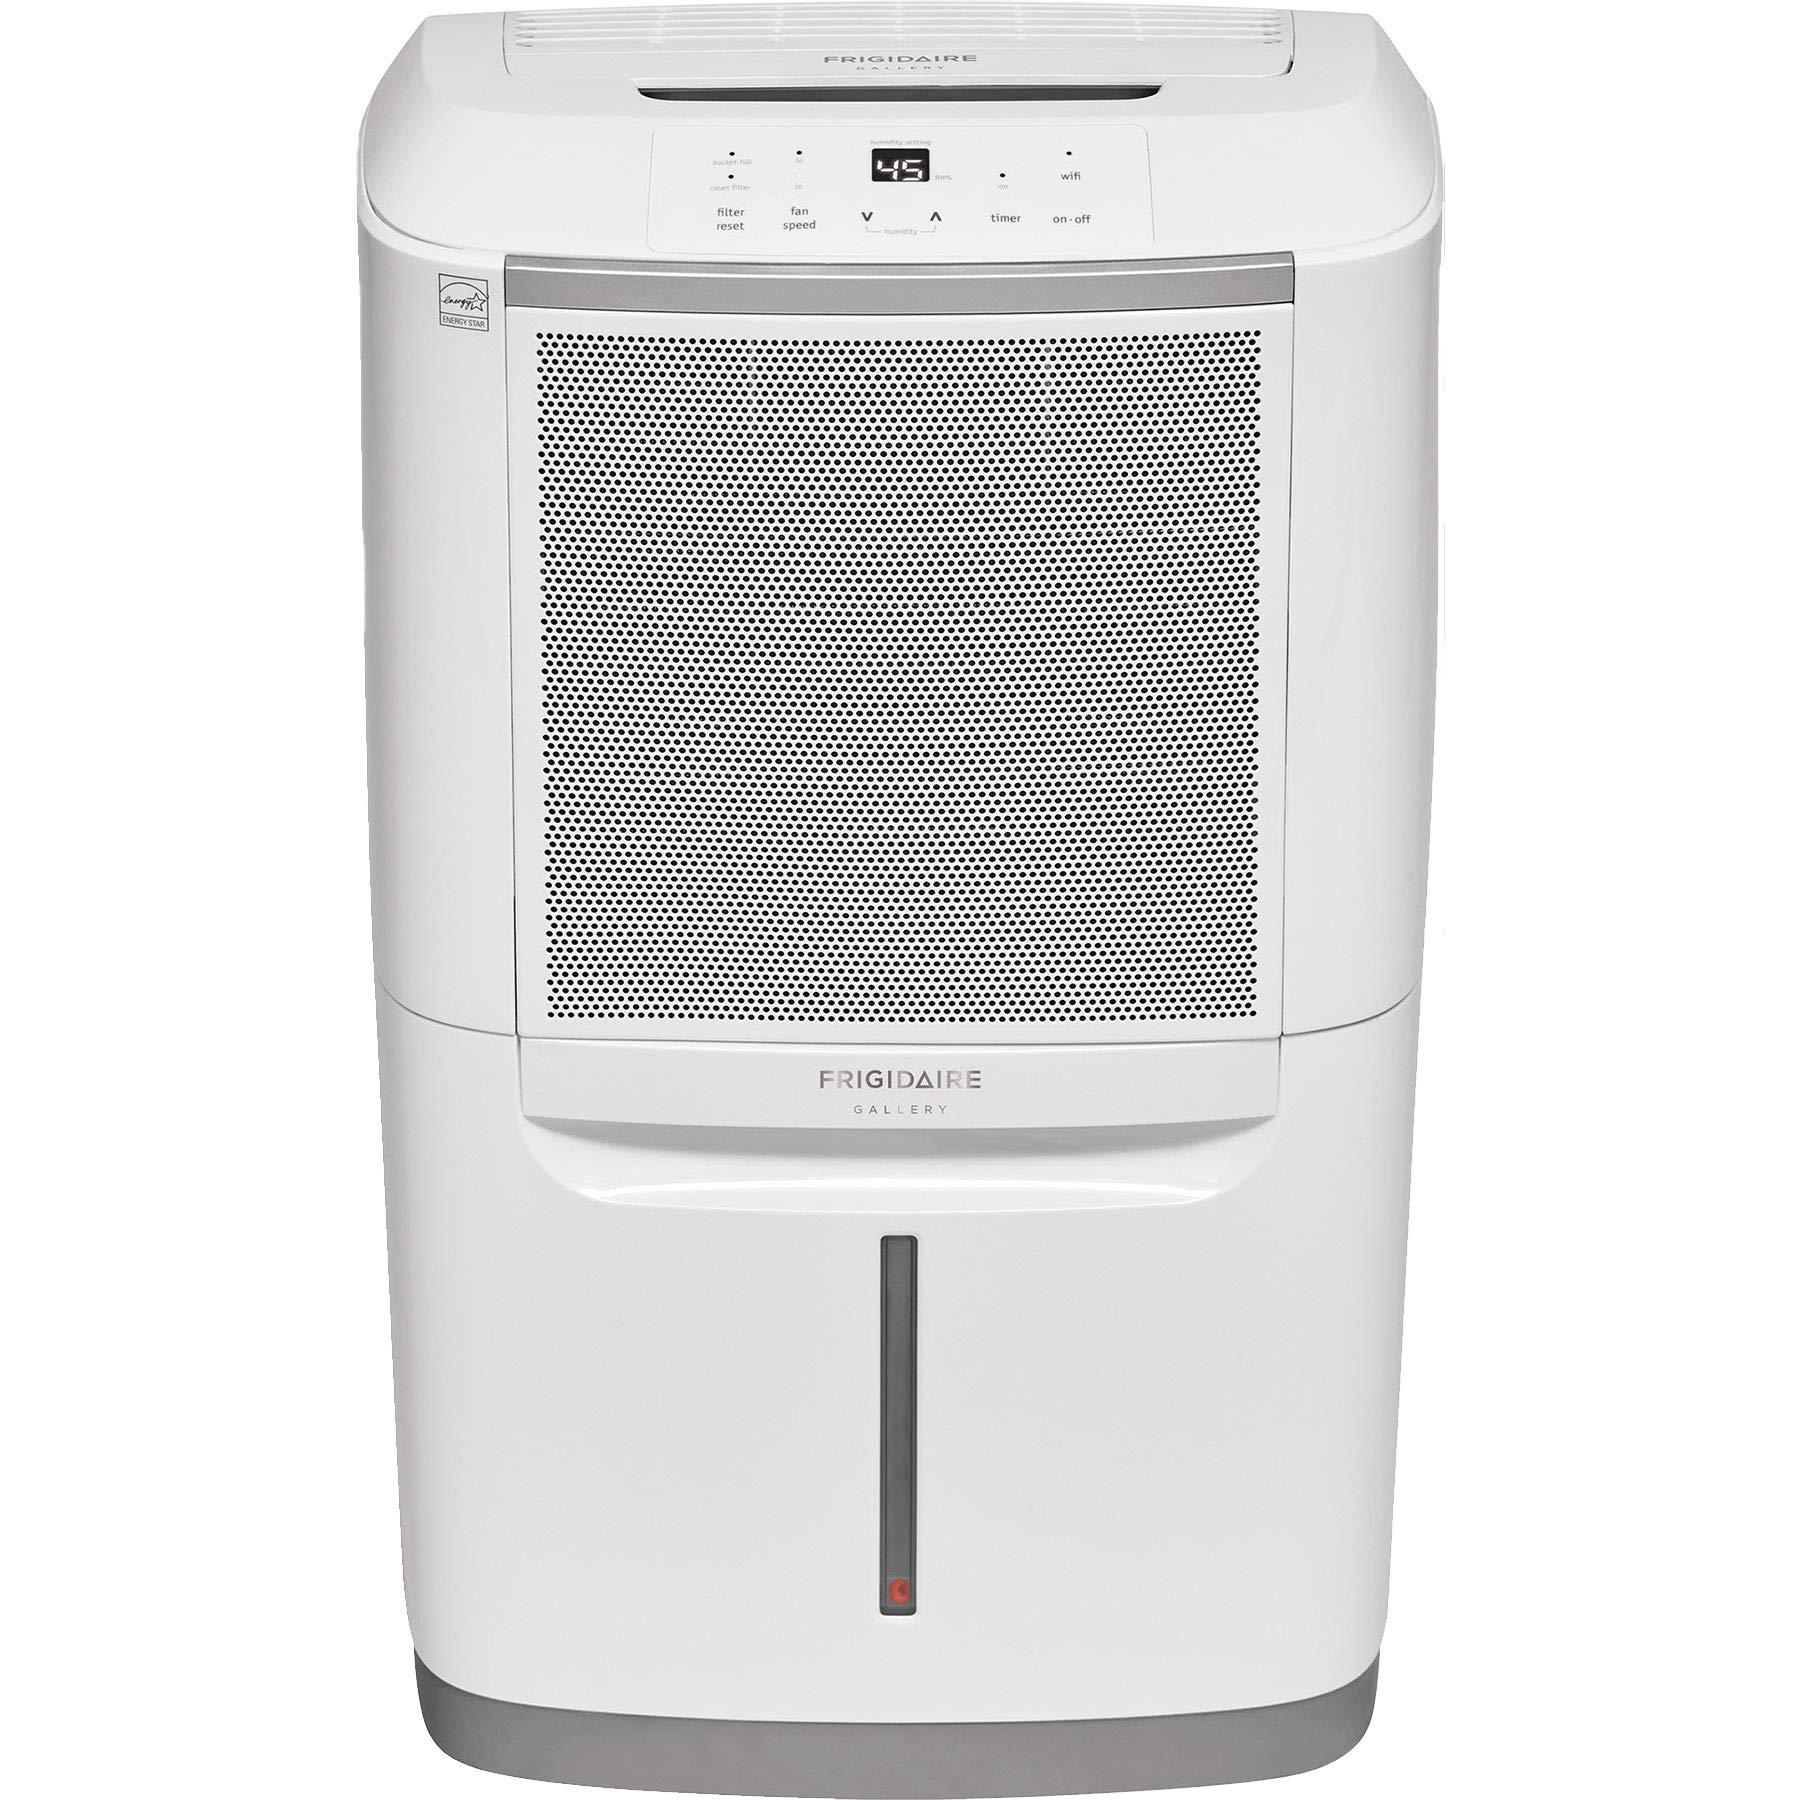 FRIGIDAIRE Dehumidifier Wi Fi Controls White